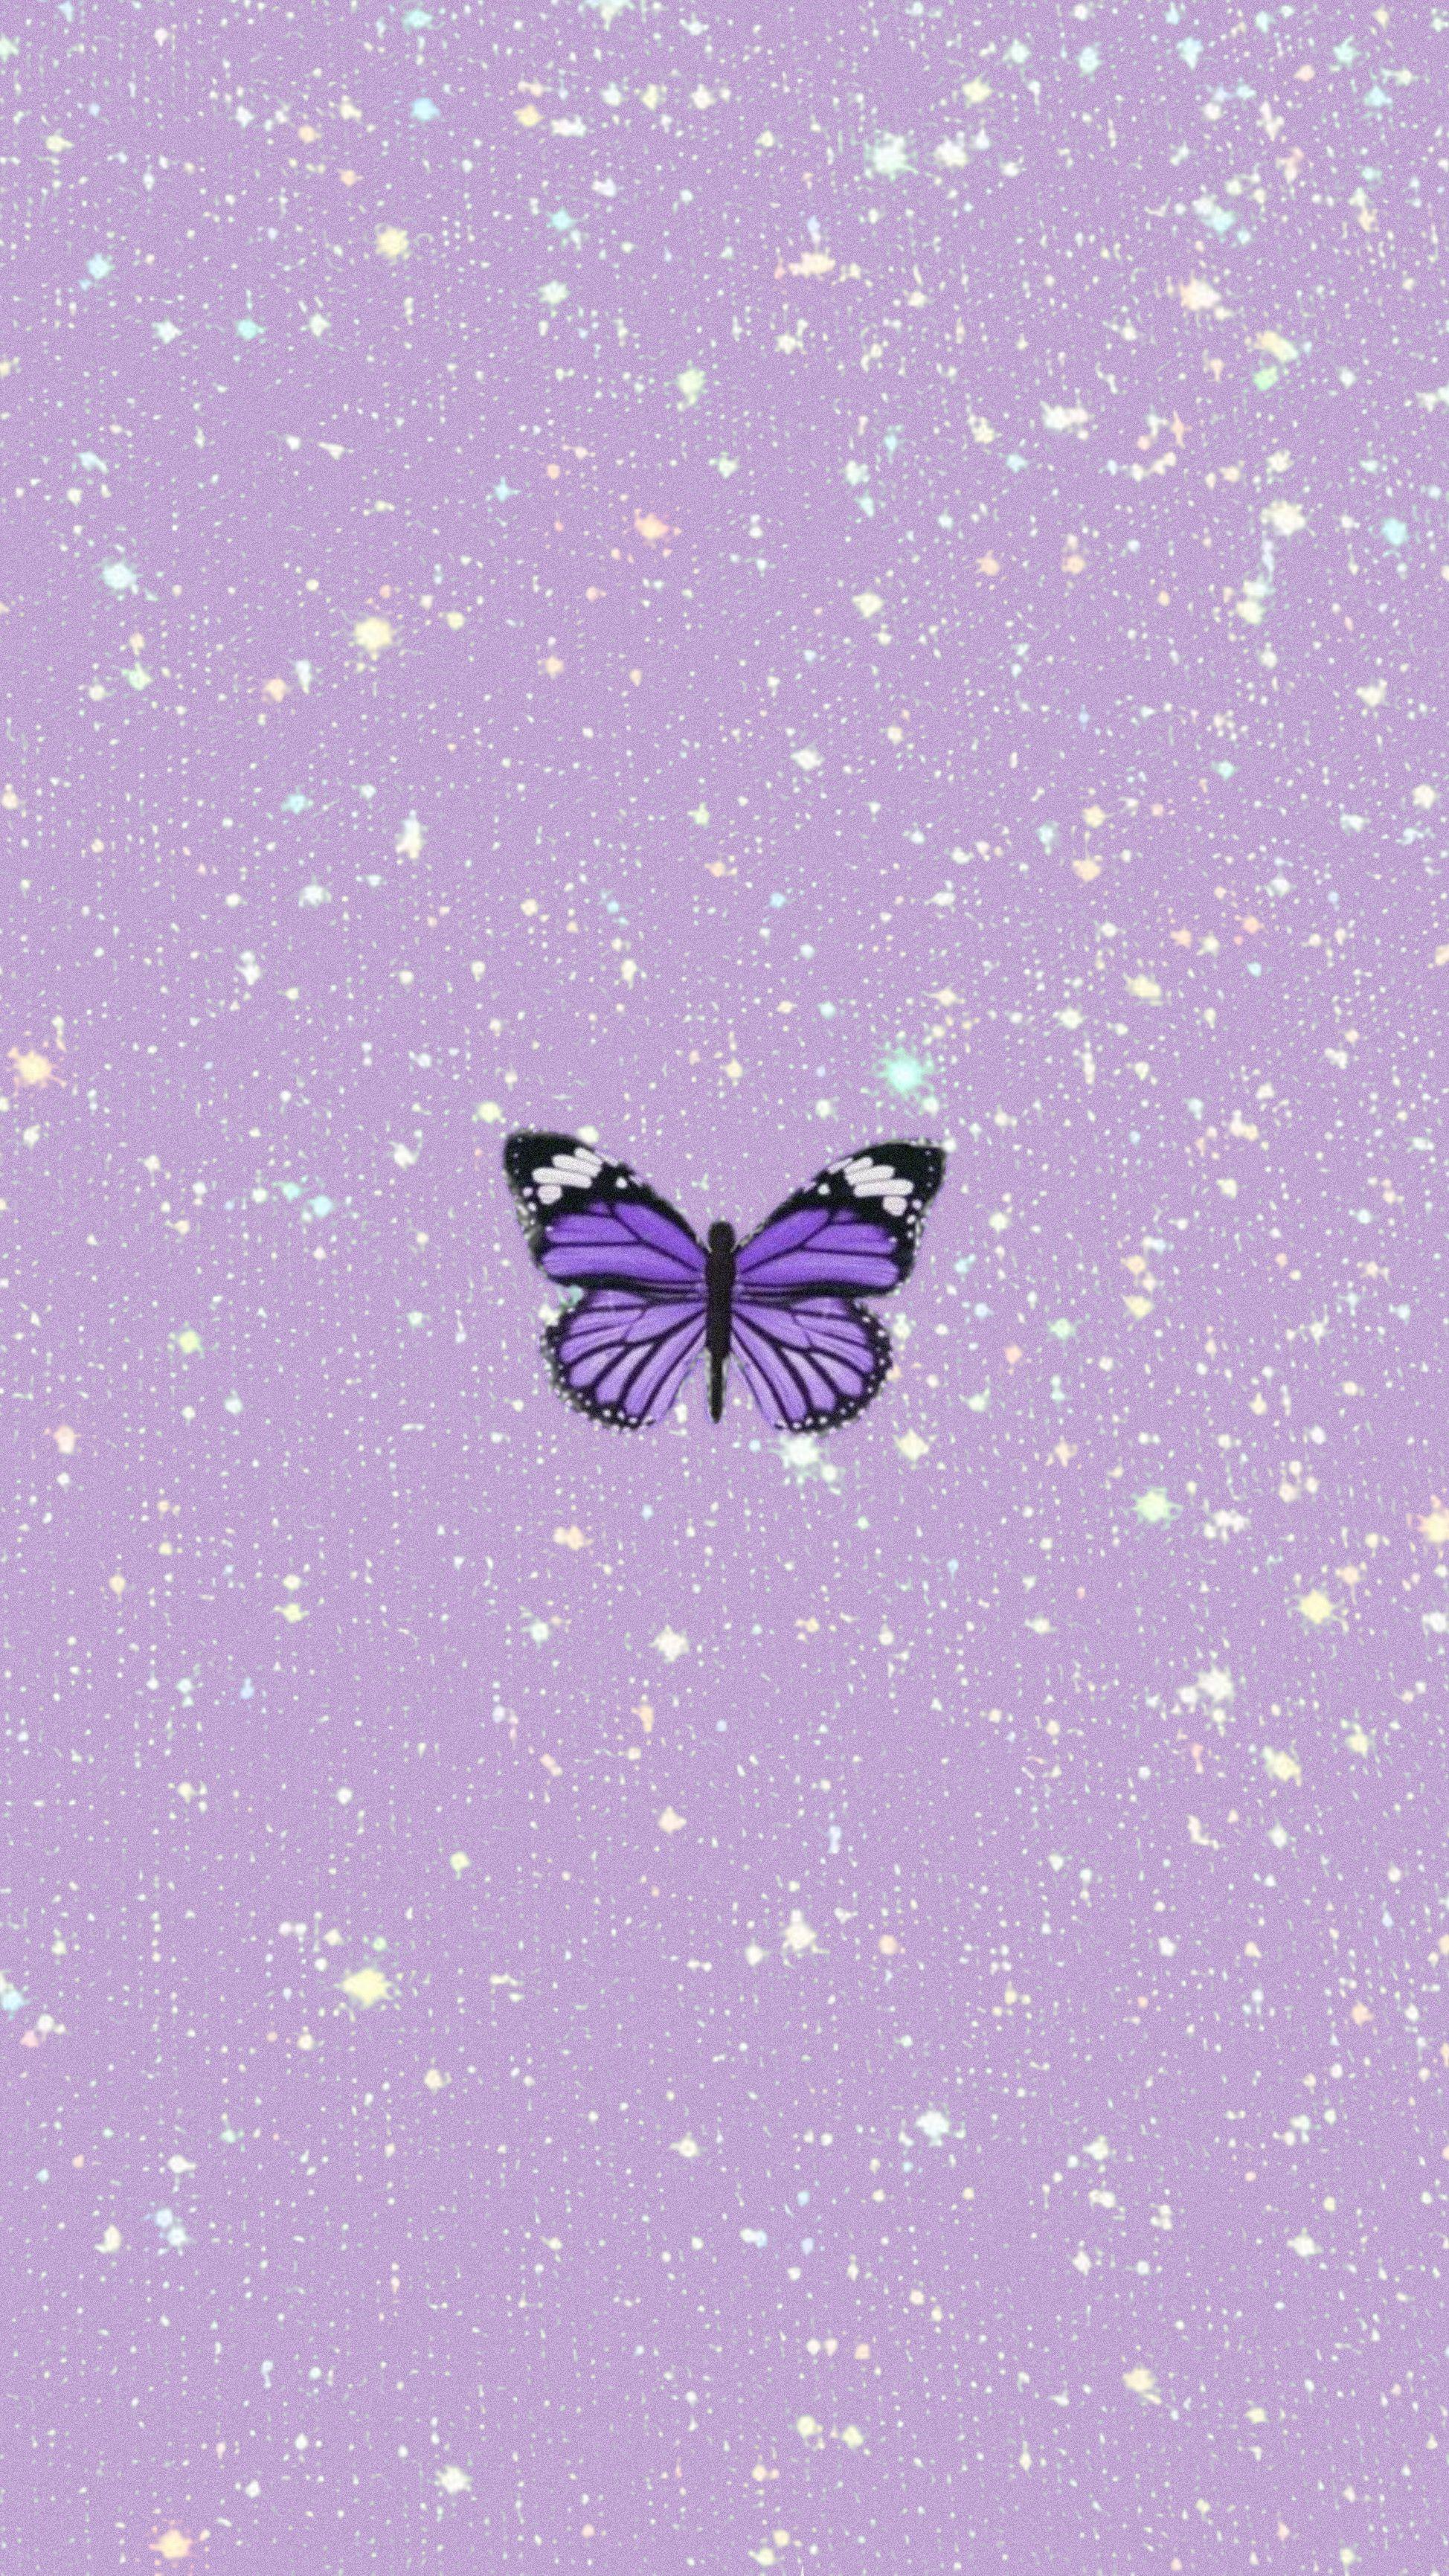 Aesthetic Pic Aesthetic Iphone Wallpaper Purple Wallpaper Iphone Butterfly Wallpaper Iphone